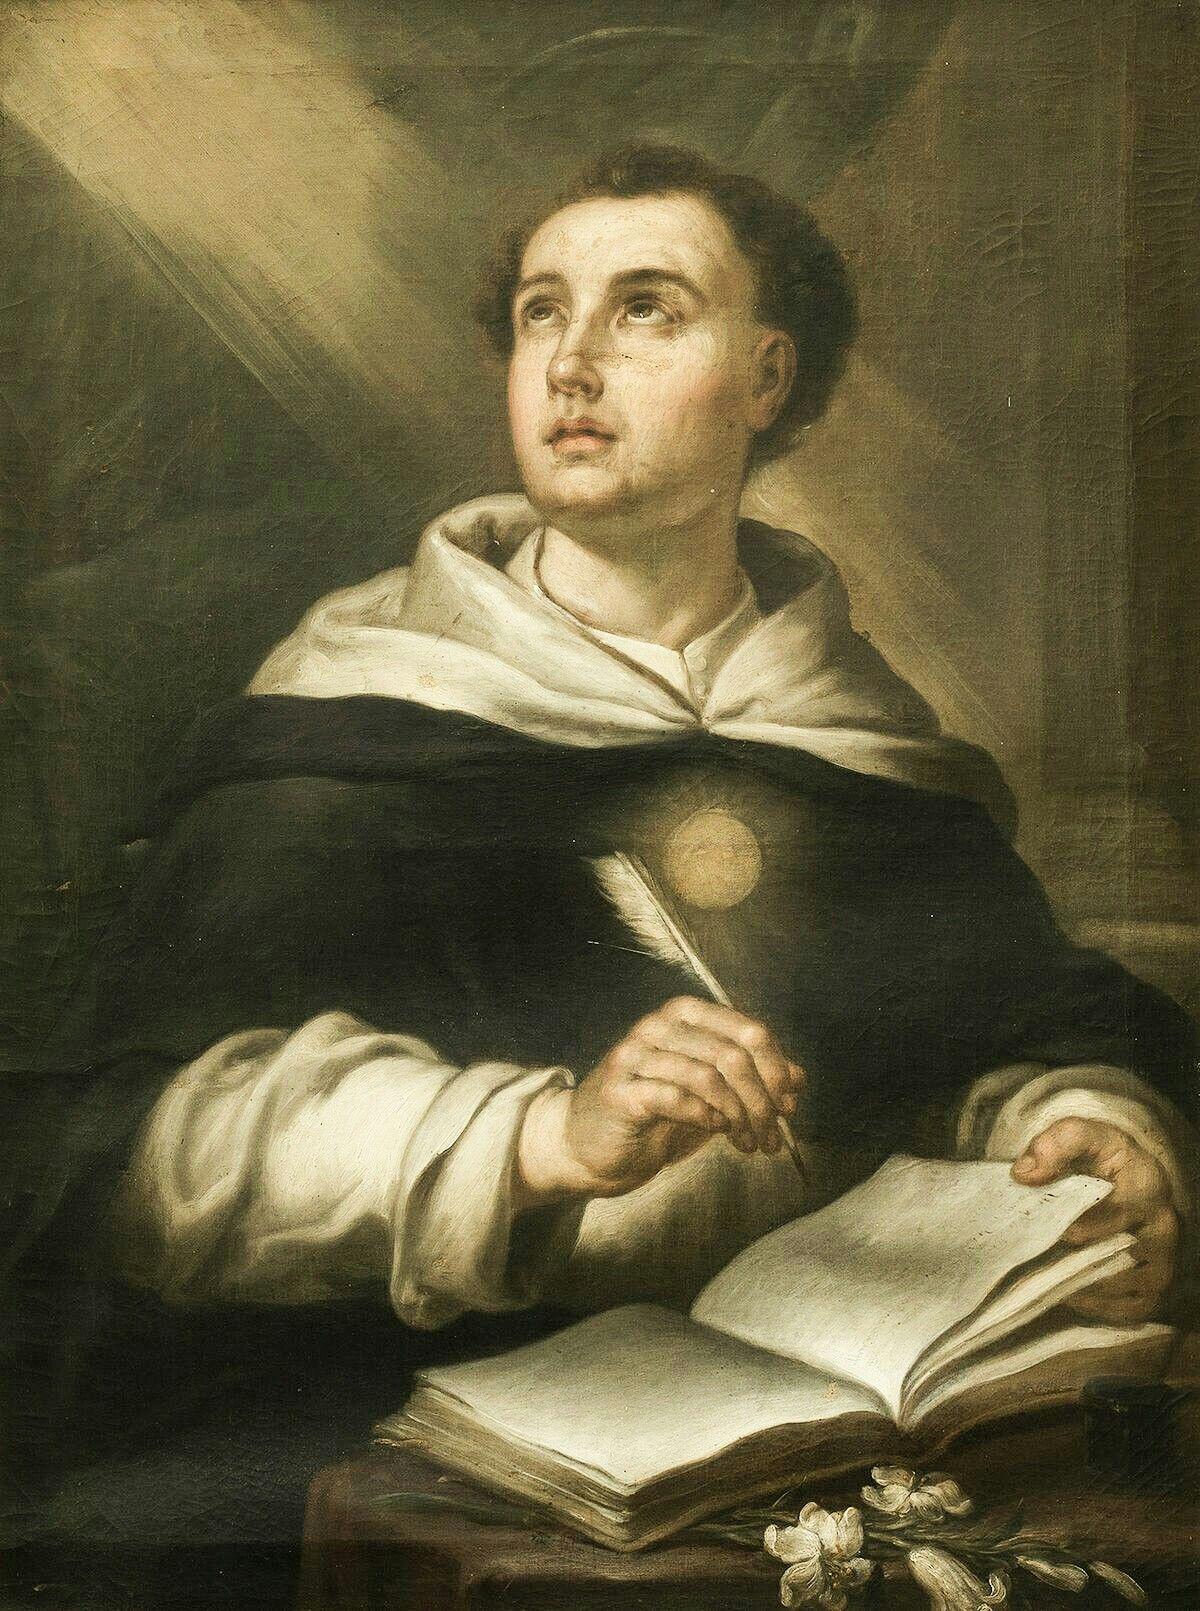 St. Thomas Aquinas | Saint thomas aquinas, Catholic images, Catholic art